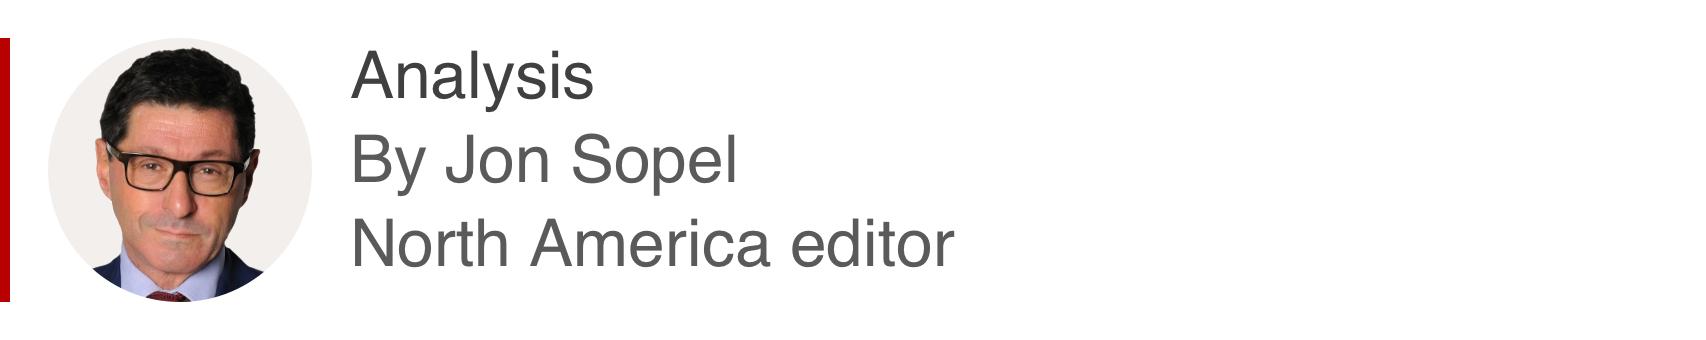 Analysis box by Jon Sopel, North America editor